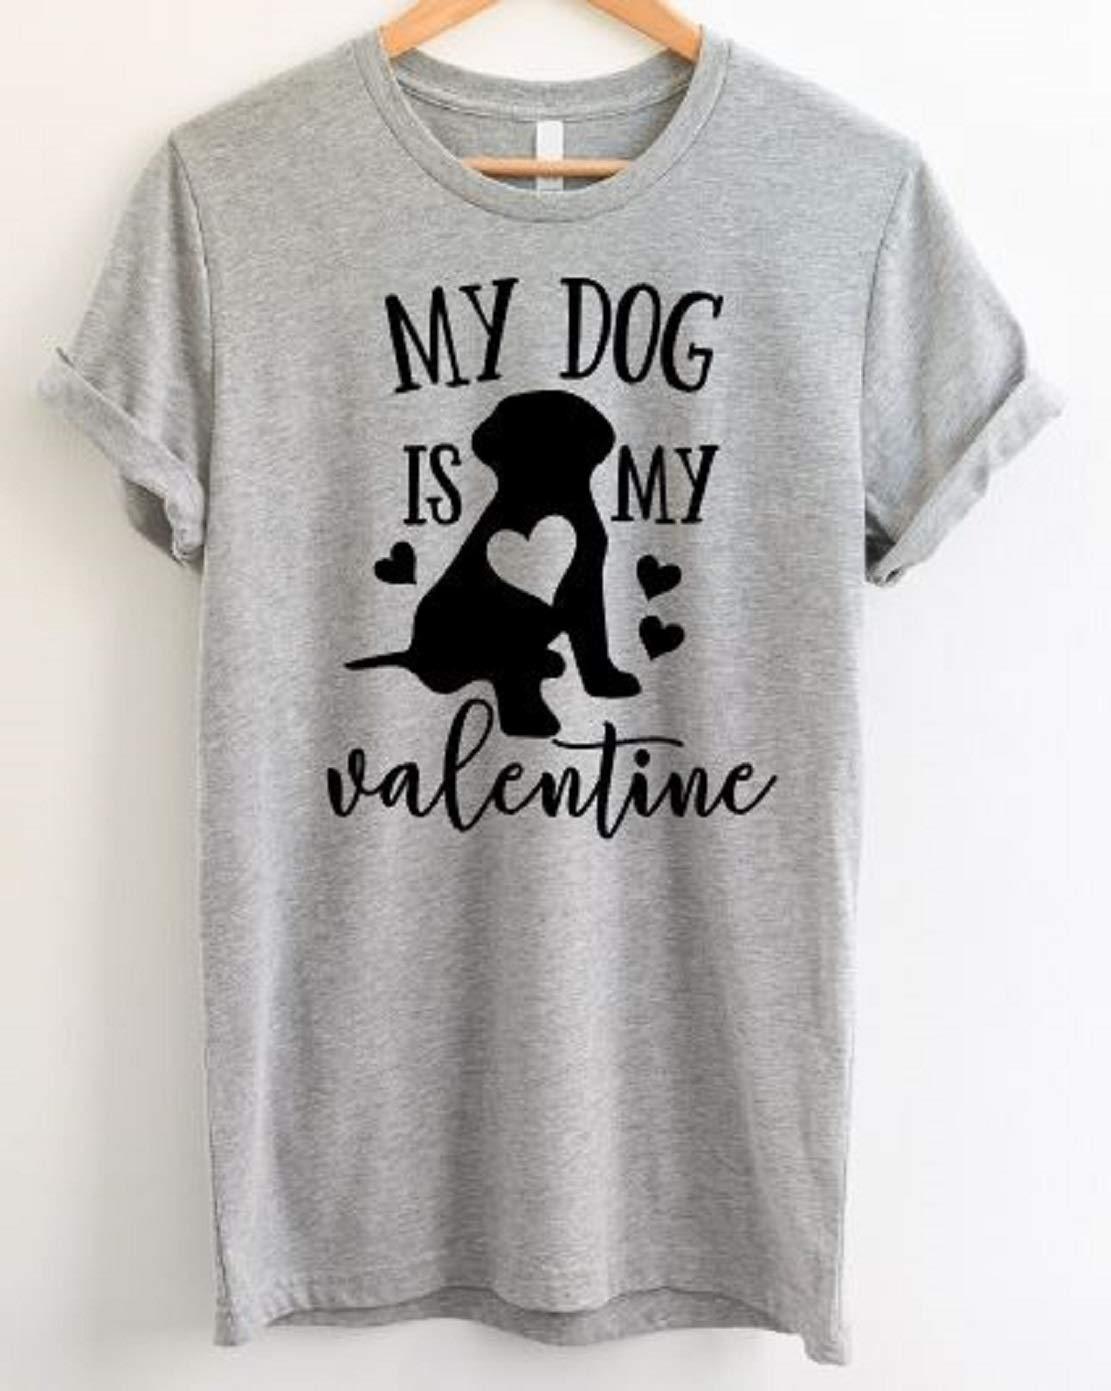 1e3429dd749a Amazon.com: My Dog Is My Valentine - Funny Valentin's Day Shirt: Handmade